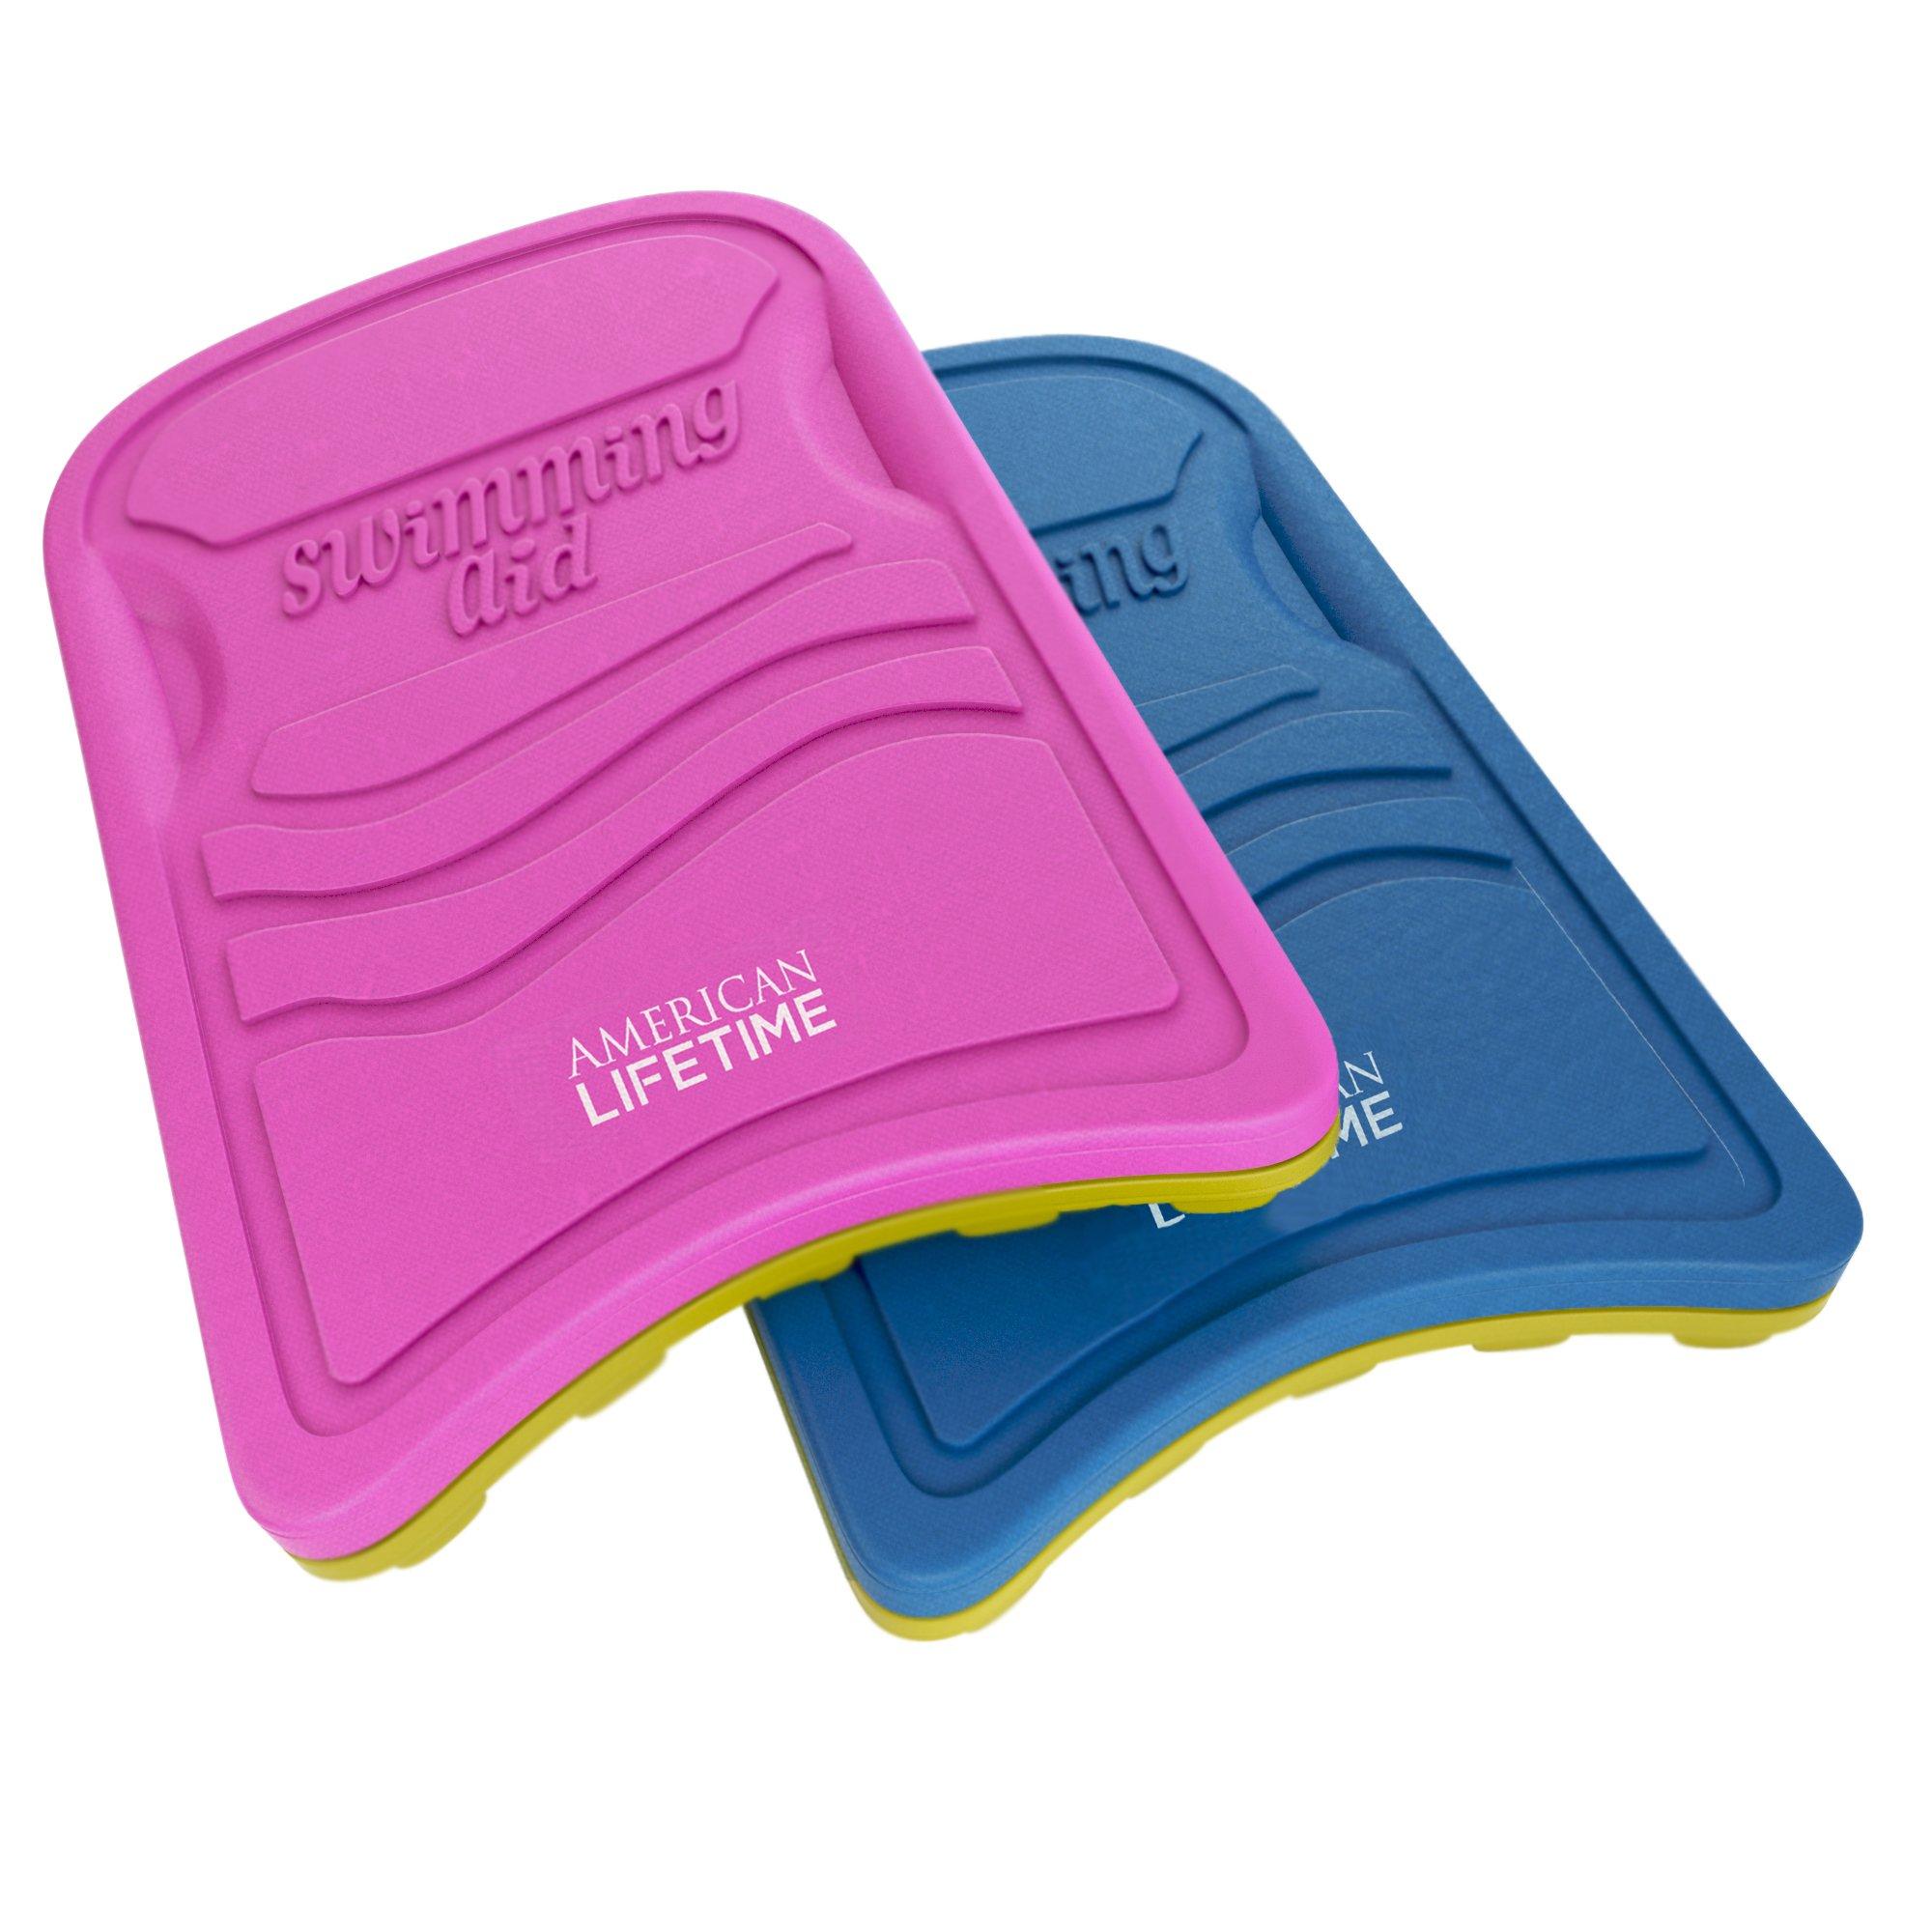 Kickboard - Lightweight Foam Swim Board - Swimming Training Aid for Adults and Kids, Pink